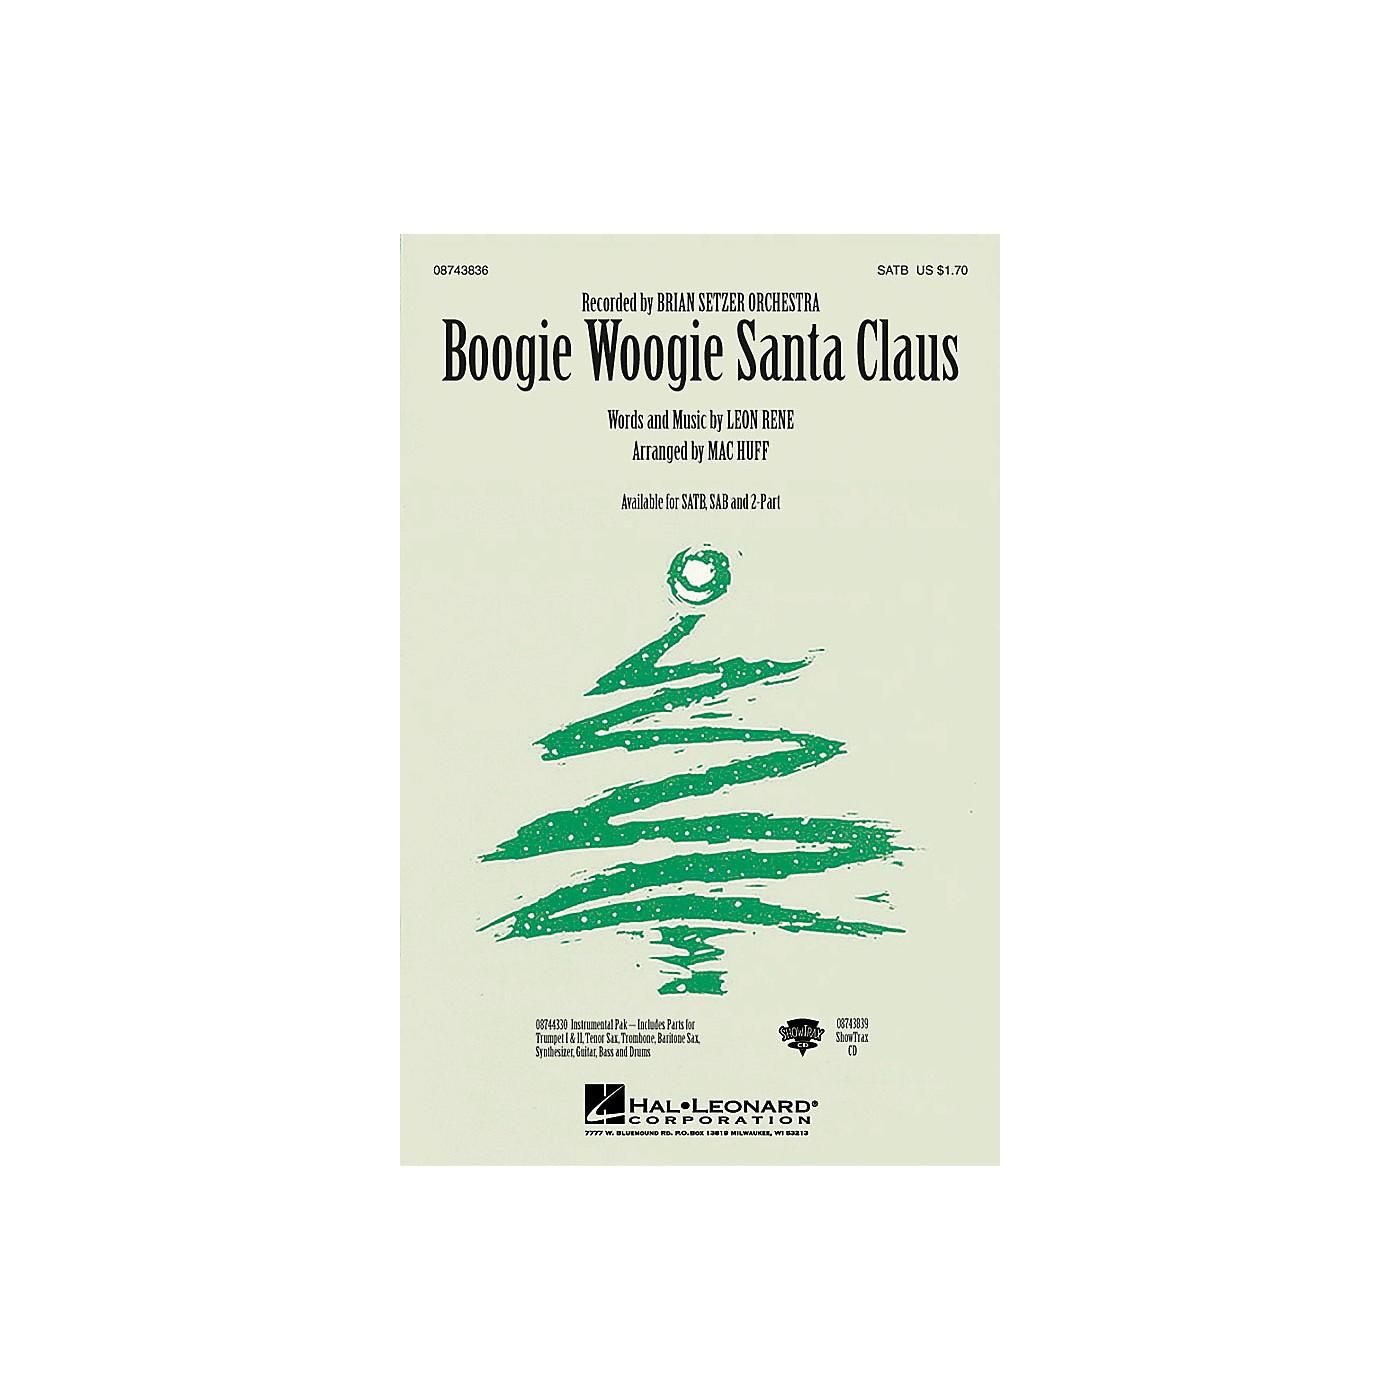 Hal Leonard Boogie Woogie Santa Claus SAB by Brian Setzer Orchestra Arranged by Mac Huff thumbnail